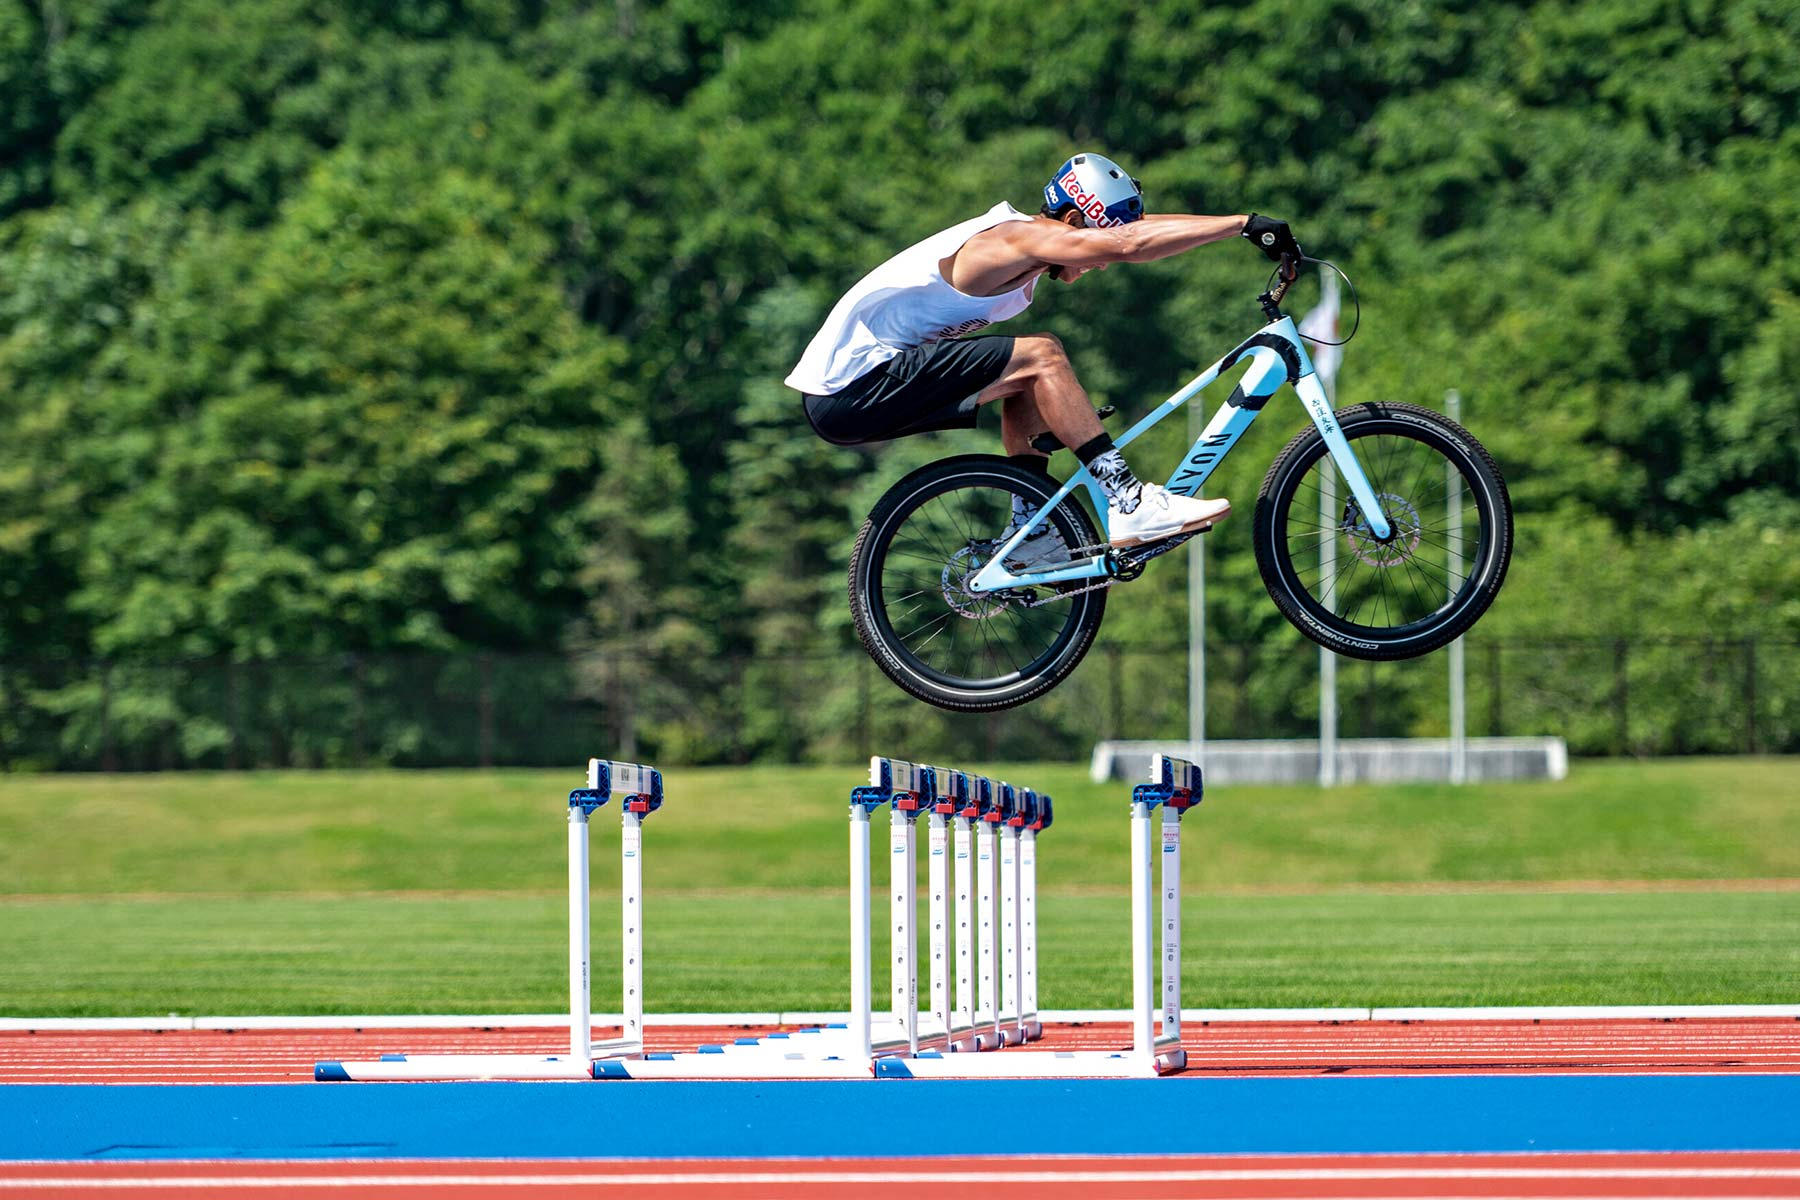 Tomomi Nishikubo The Bike Pentathlon Japan, Red Bull trials track and field, photo by Satoshi Saijo,hurdles